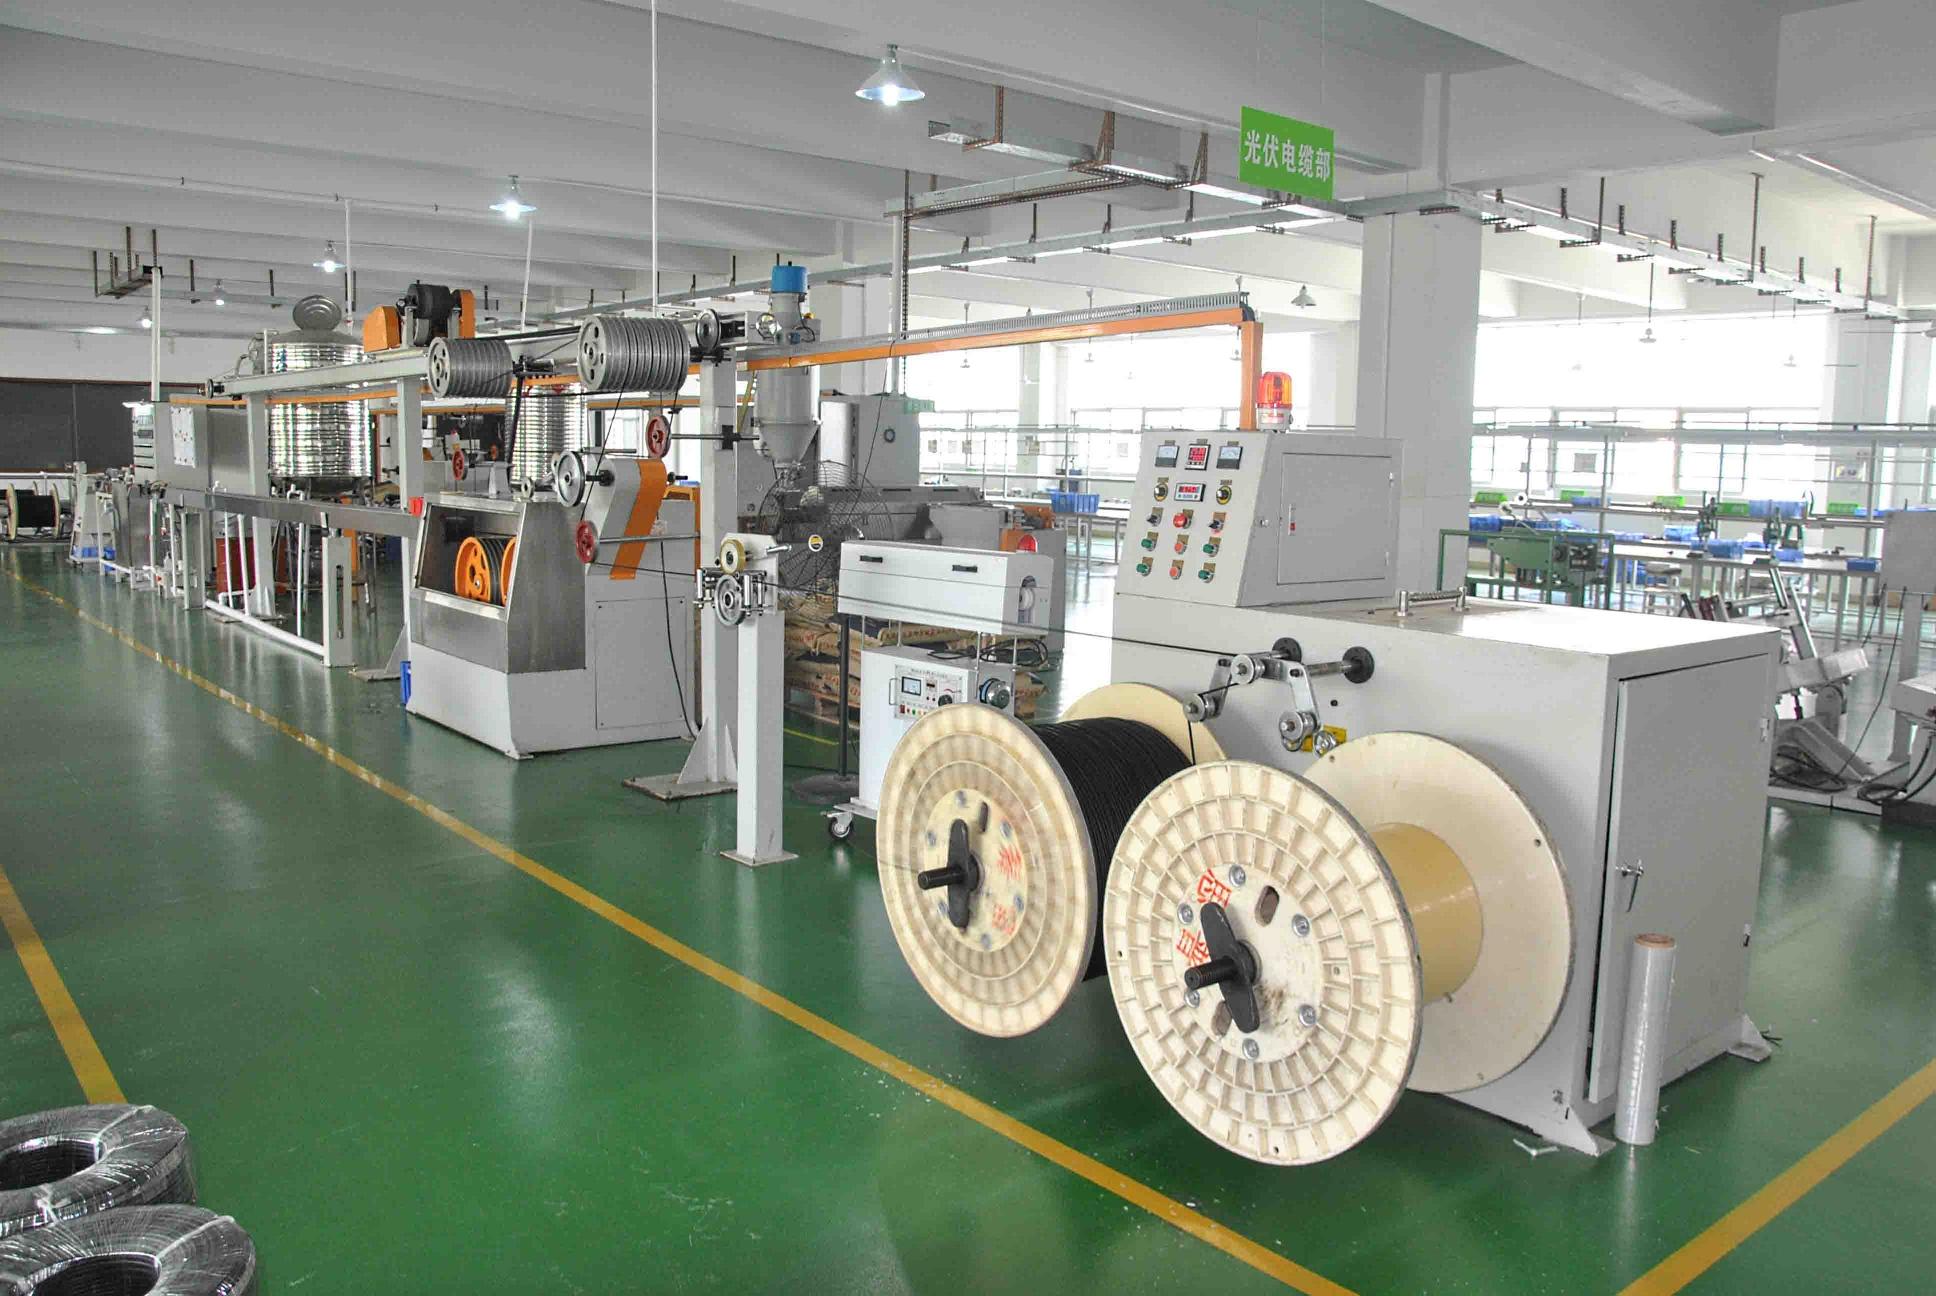 оборудование на фабрике Slocable